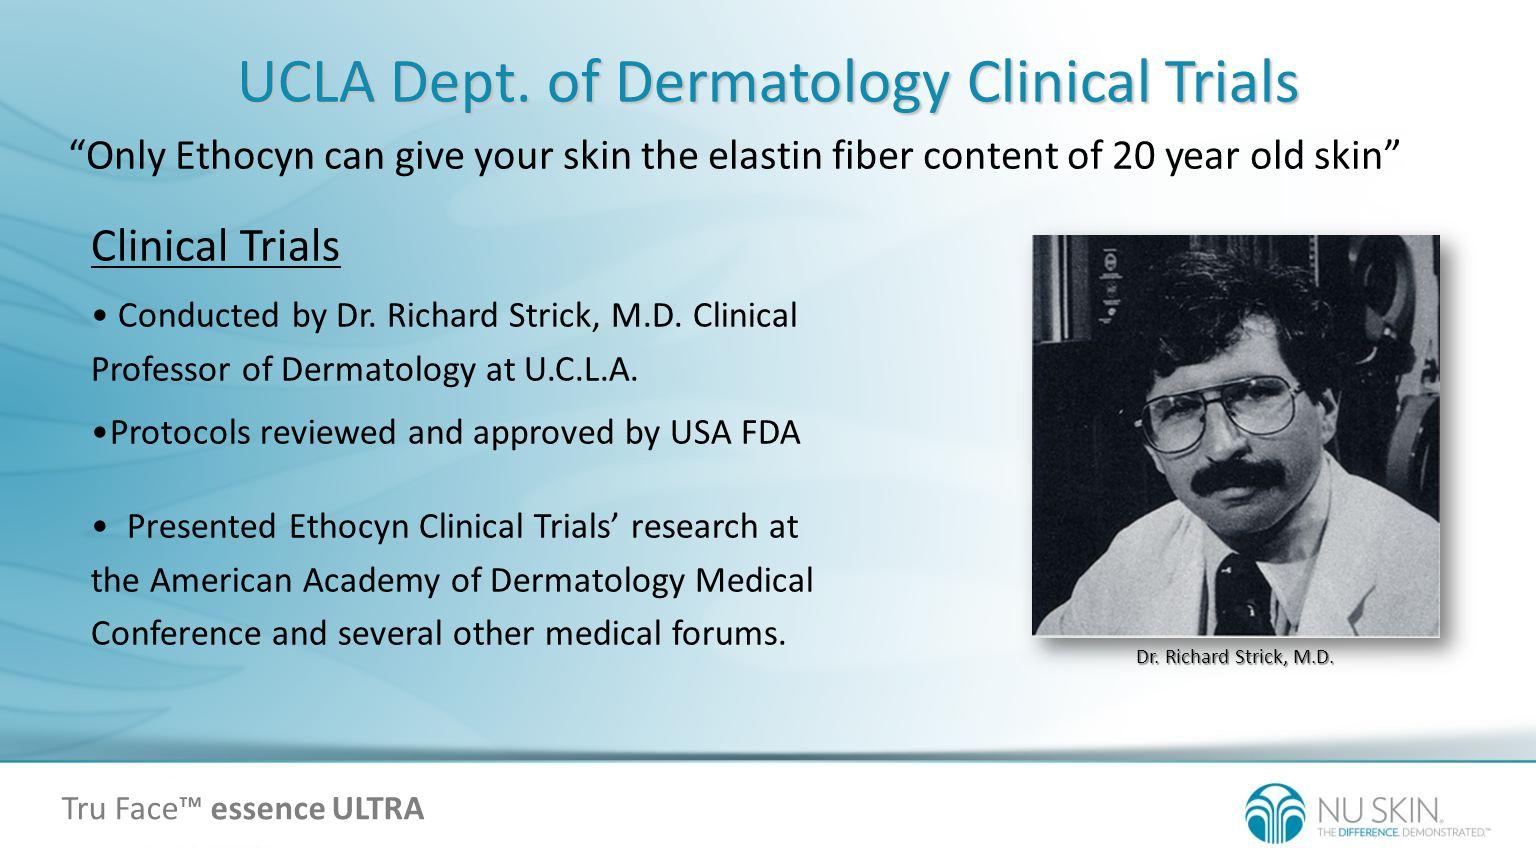 UCLA Dept. of Dermatology Clinical Trials